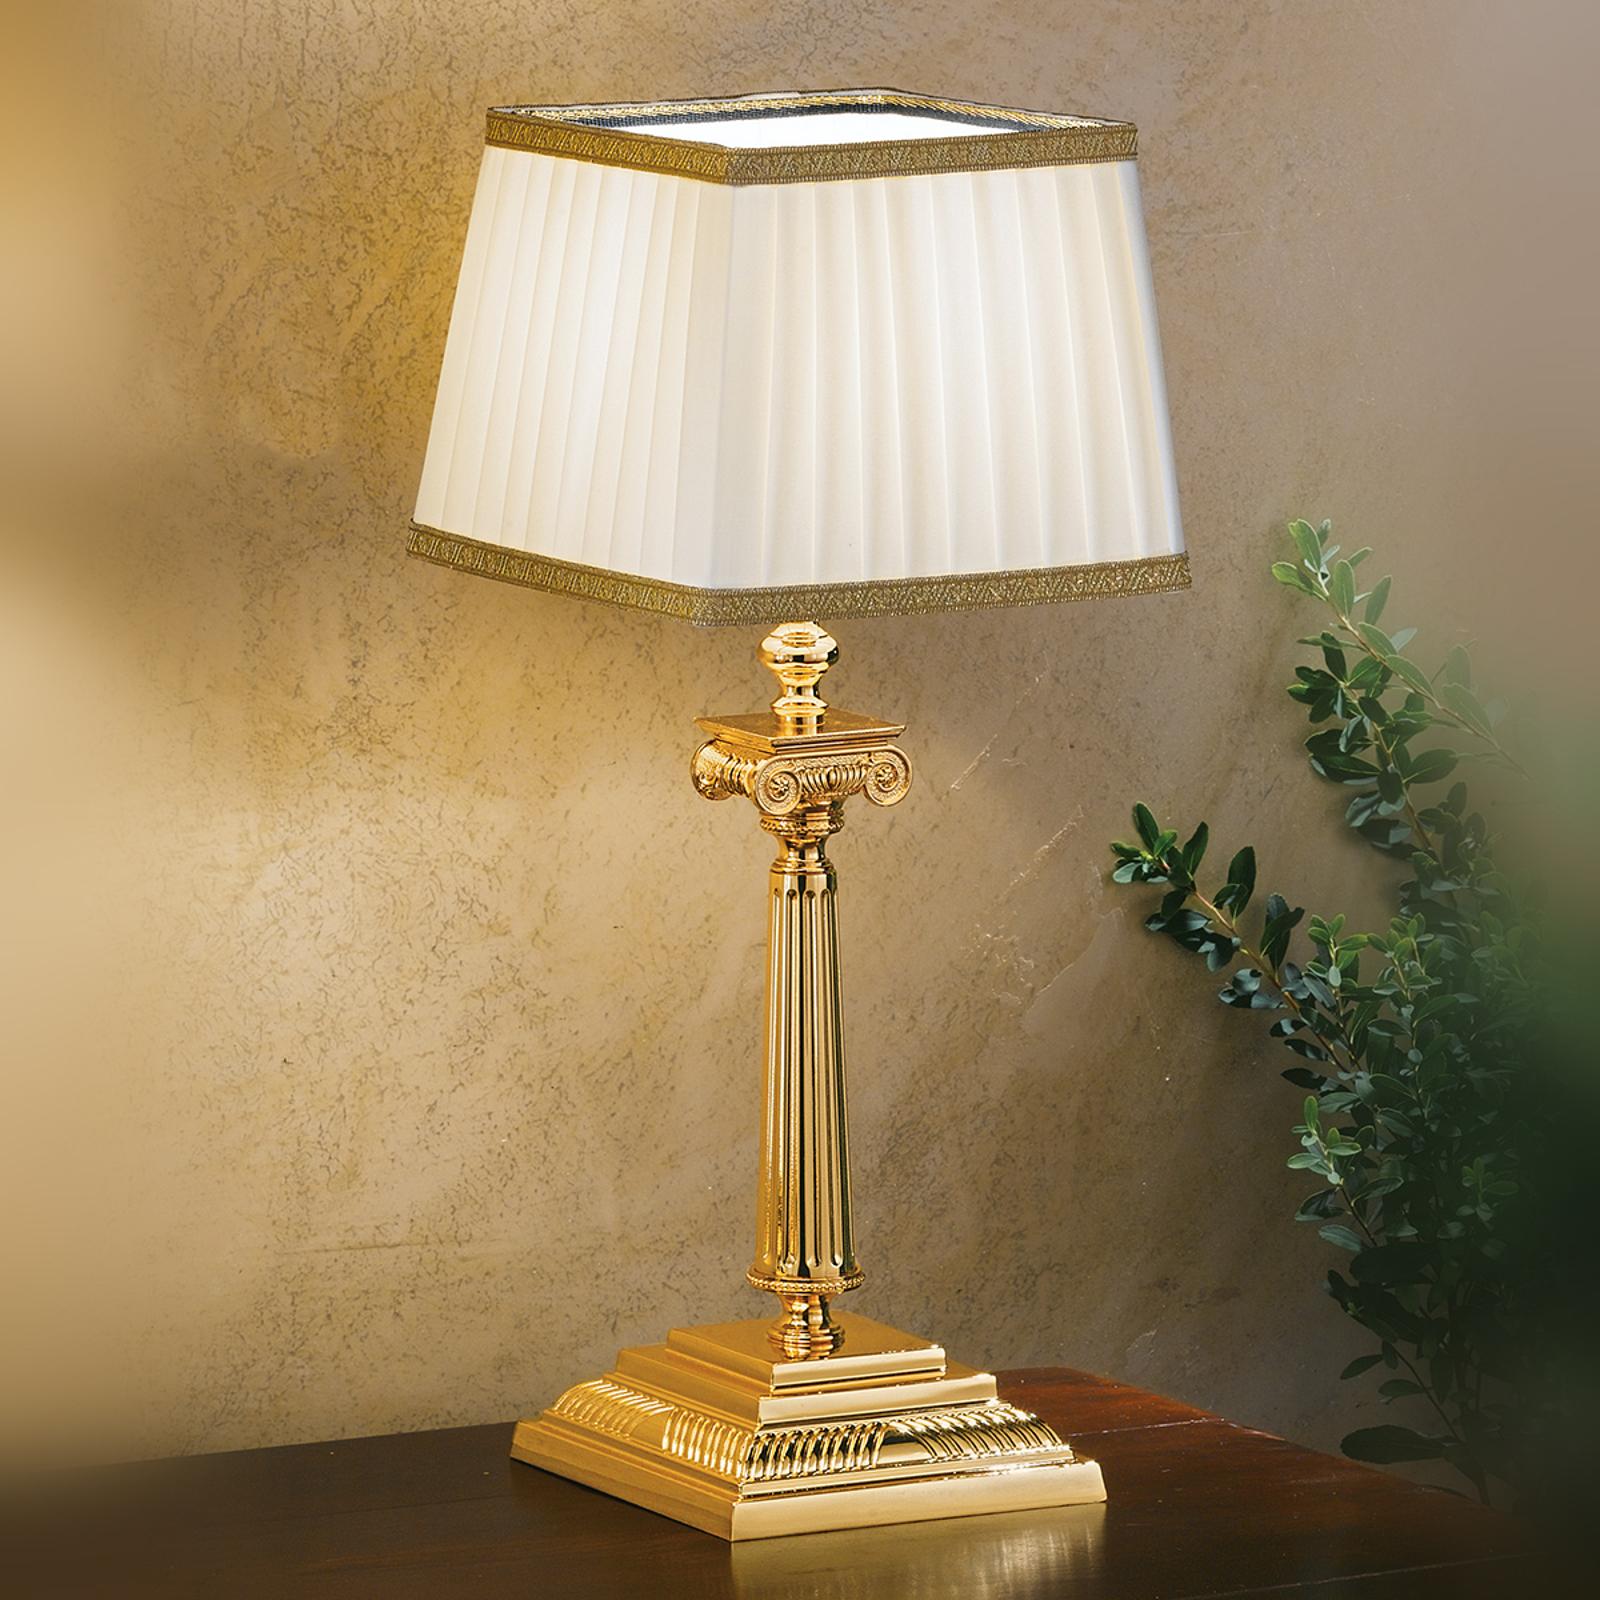 Lampe à poser Sarafine, 41 cm de haut